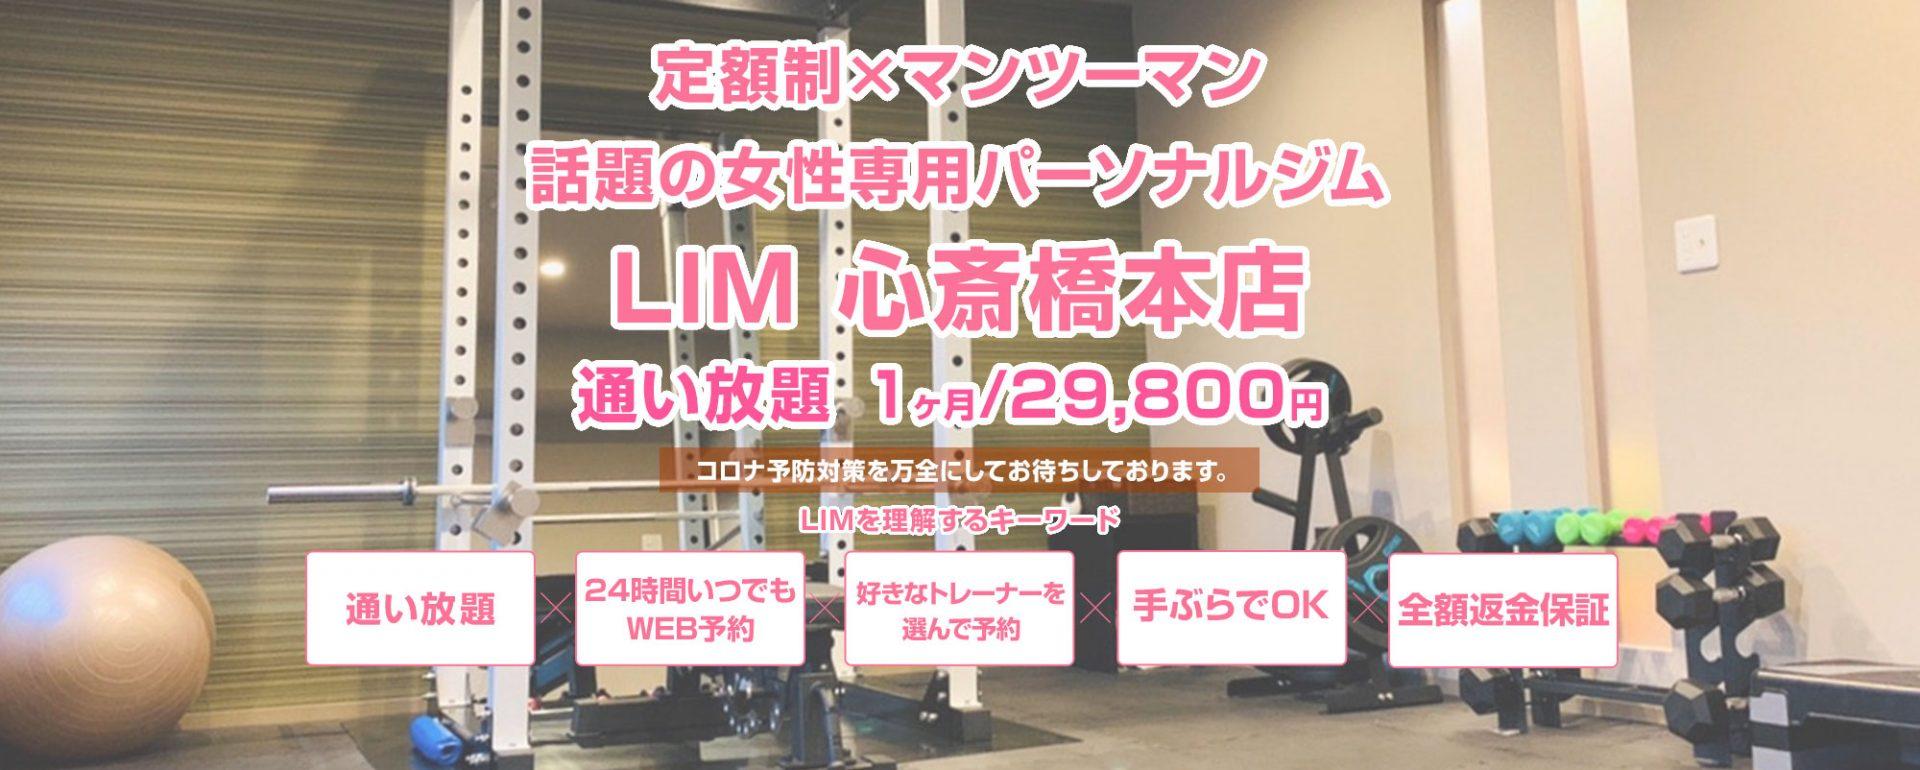 LIM心斎橋本店